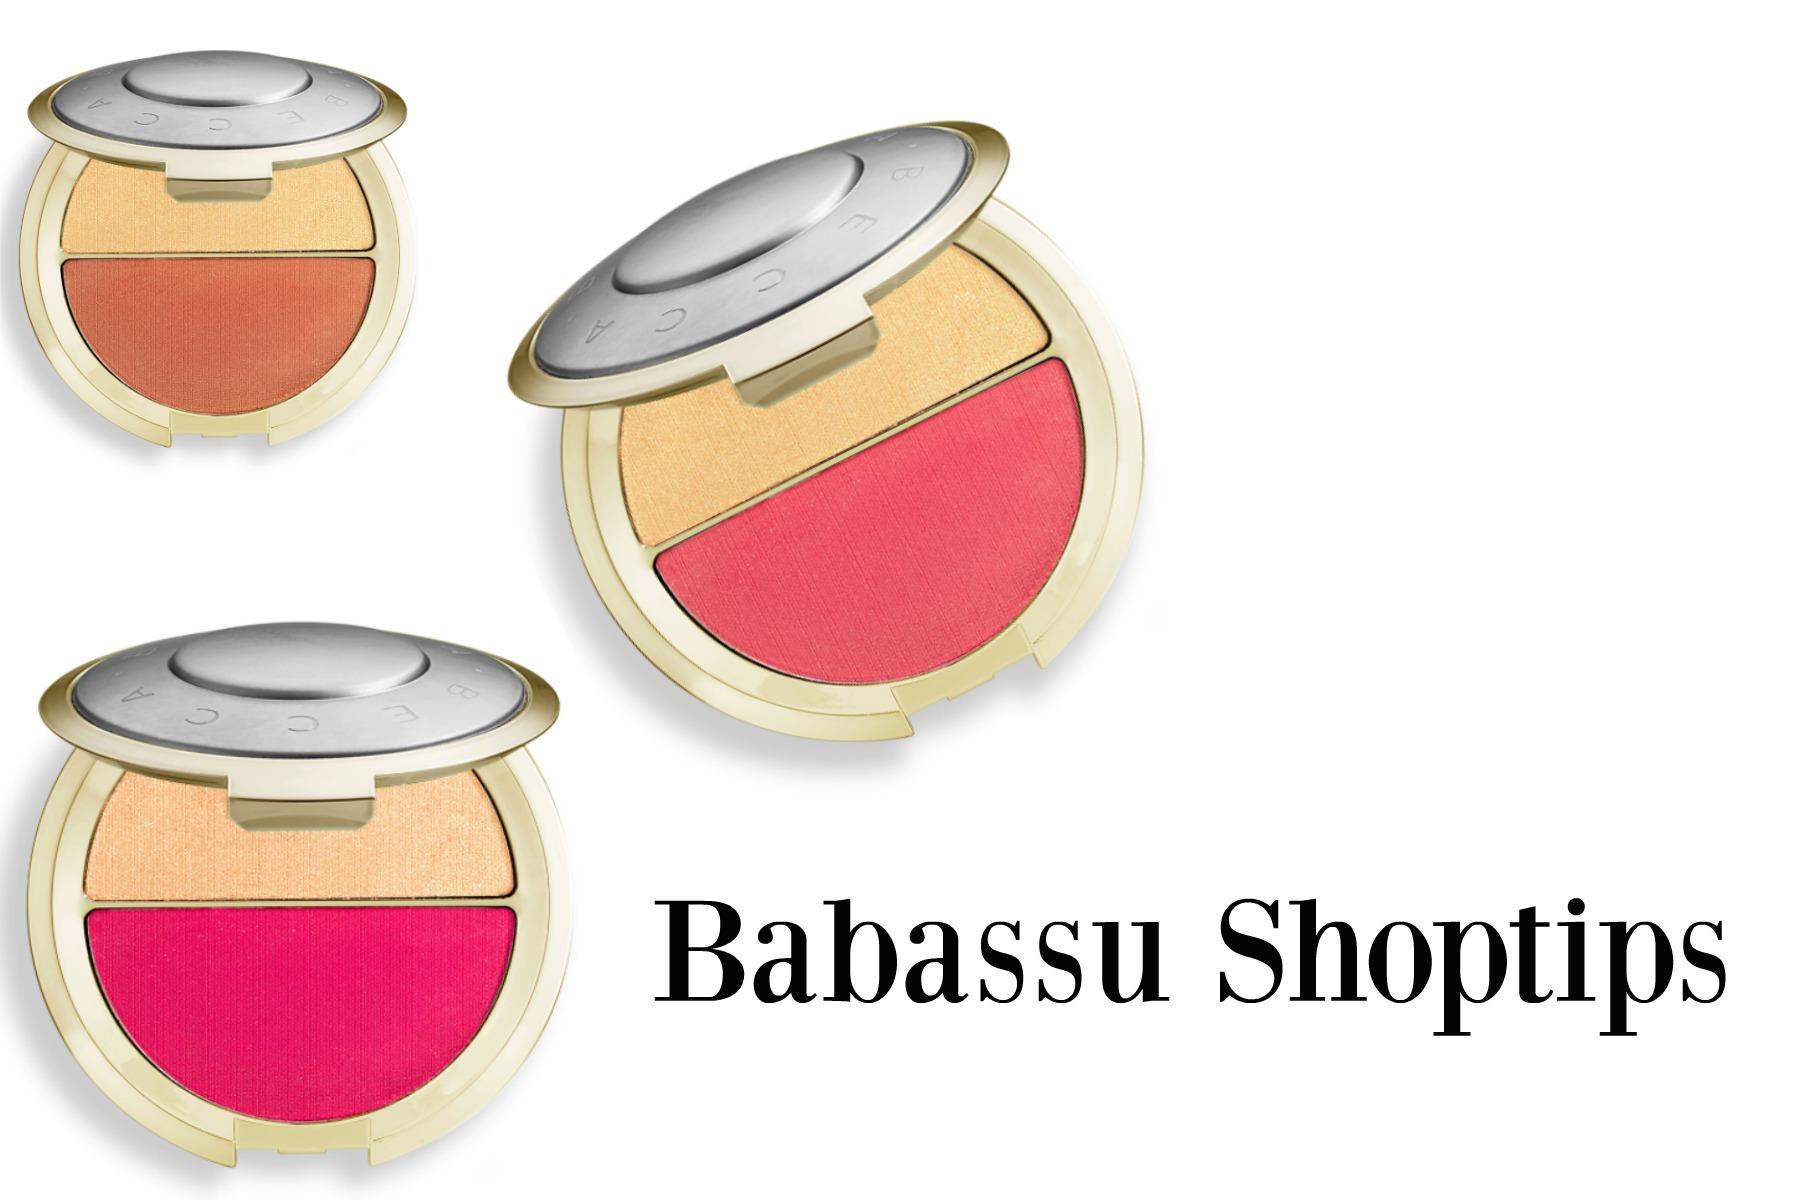 Babassu Shoptips